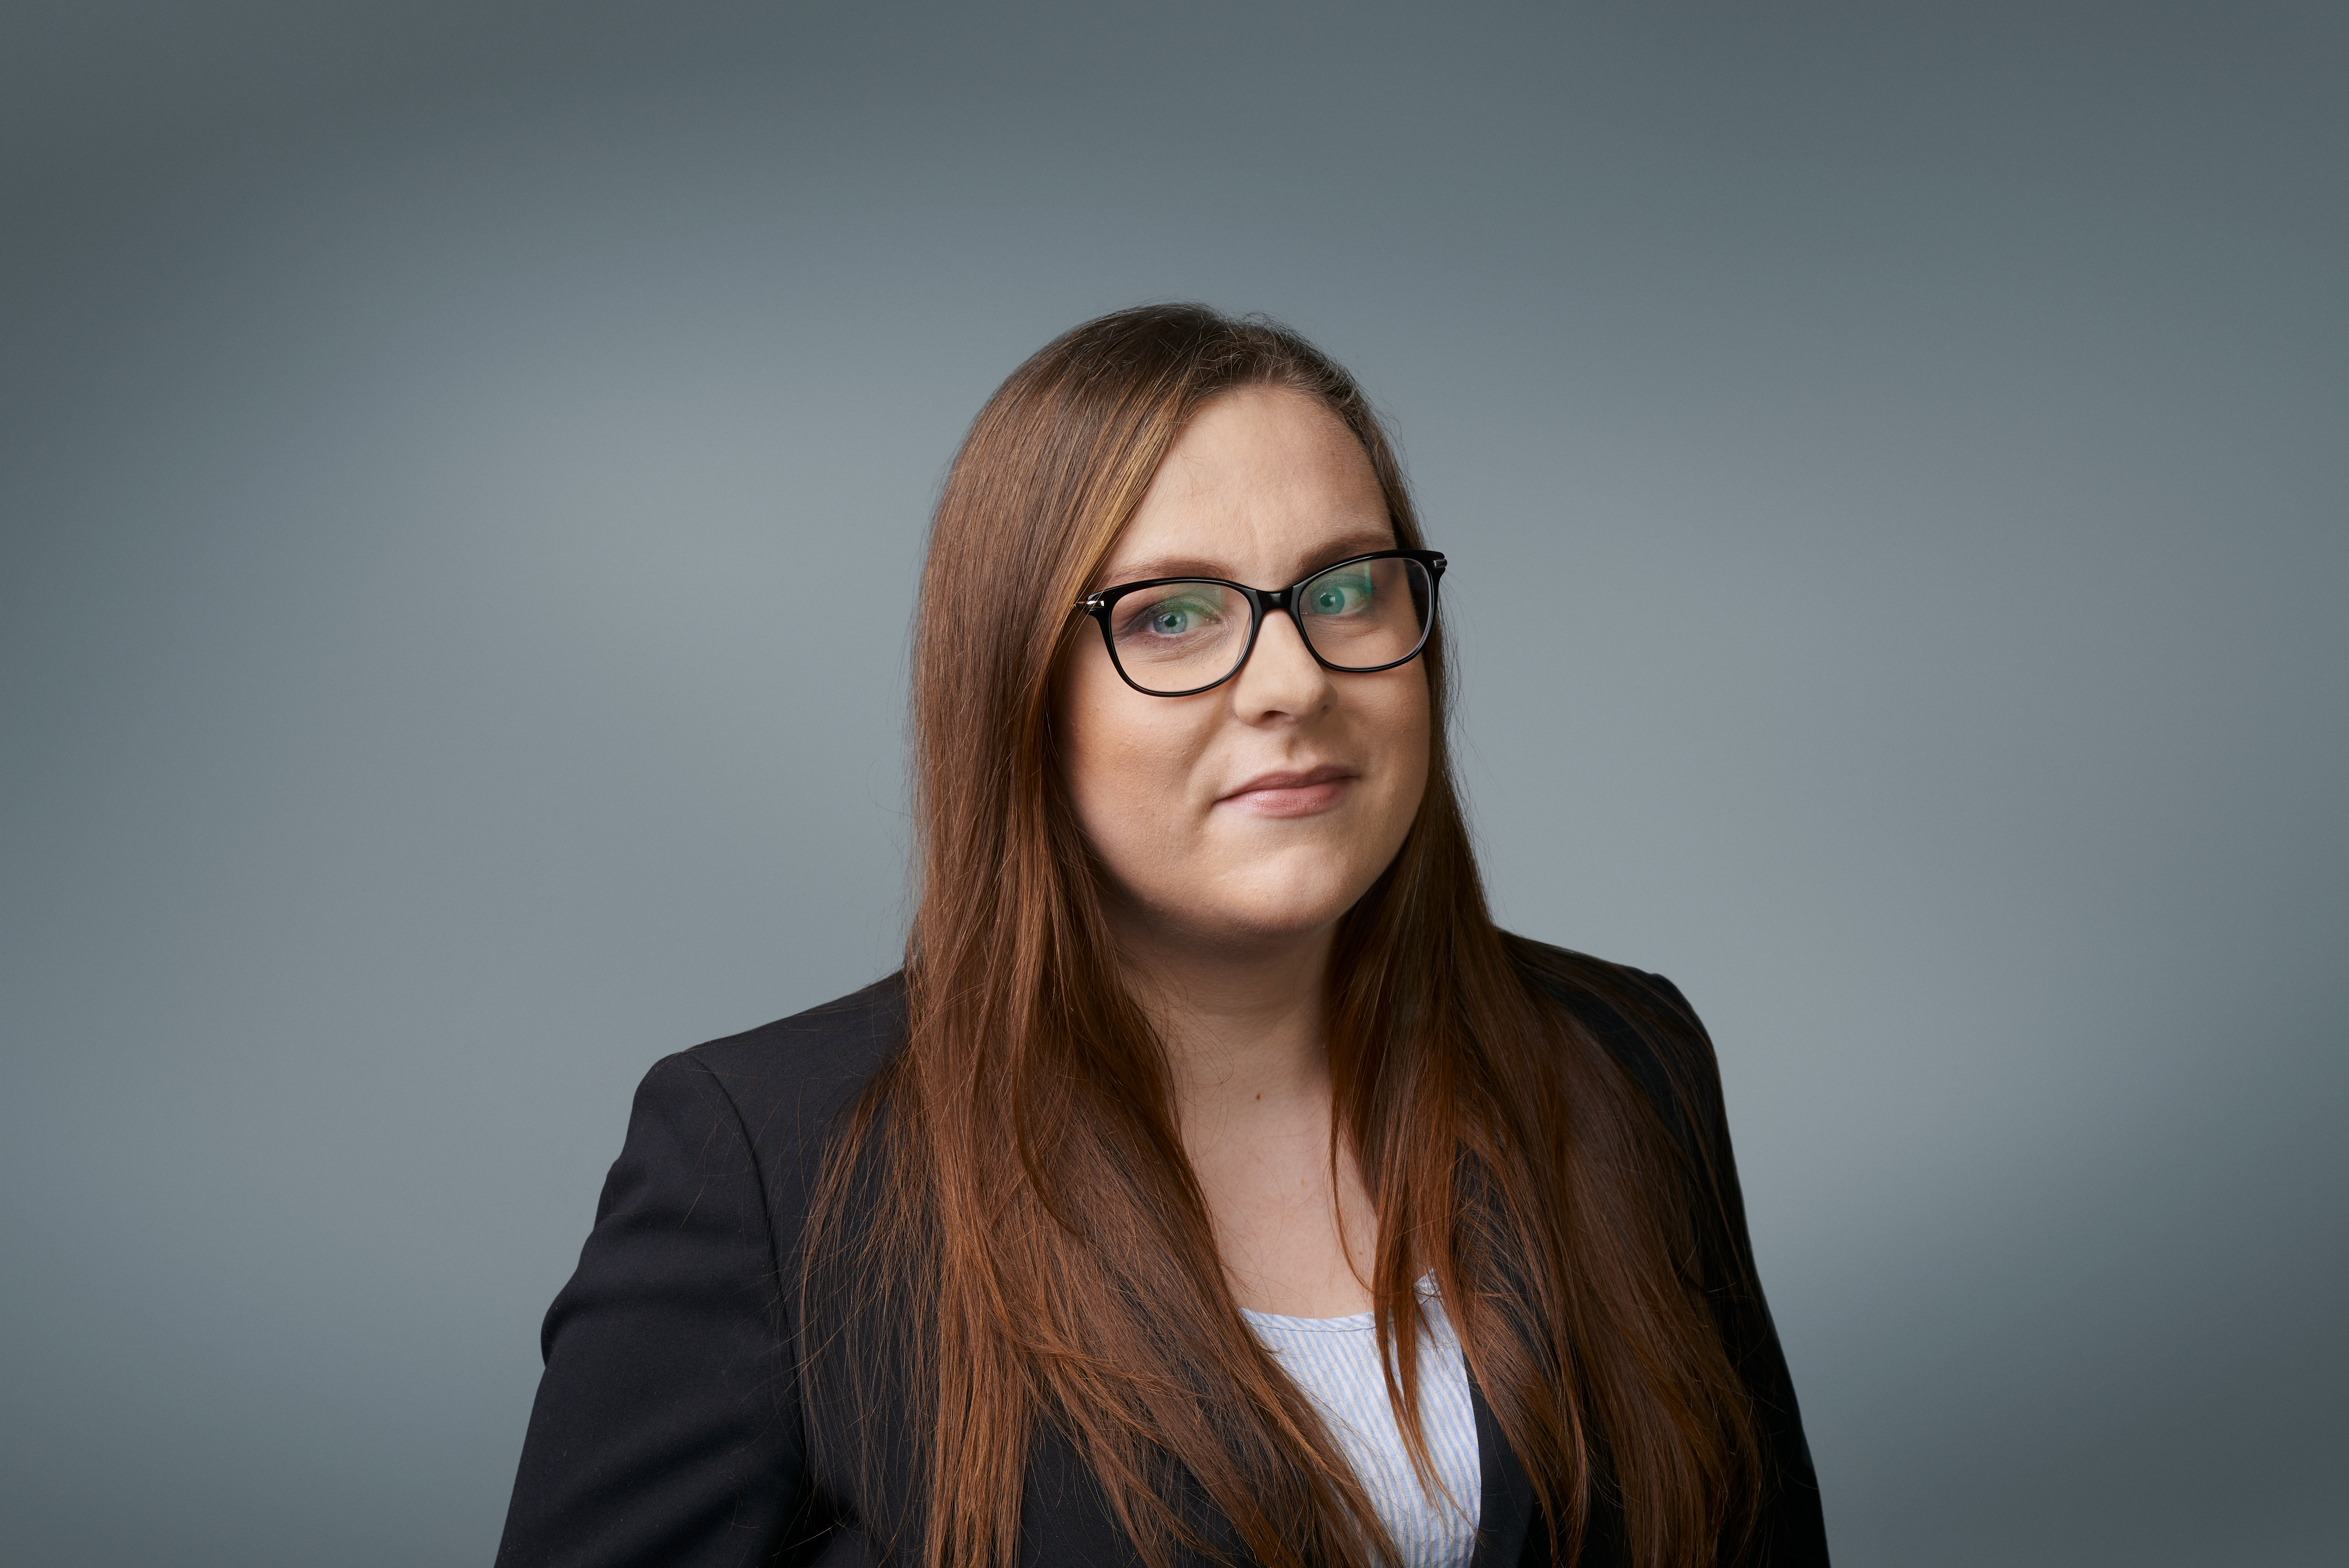 Marta Lisowska